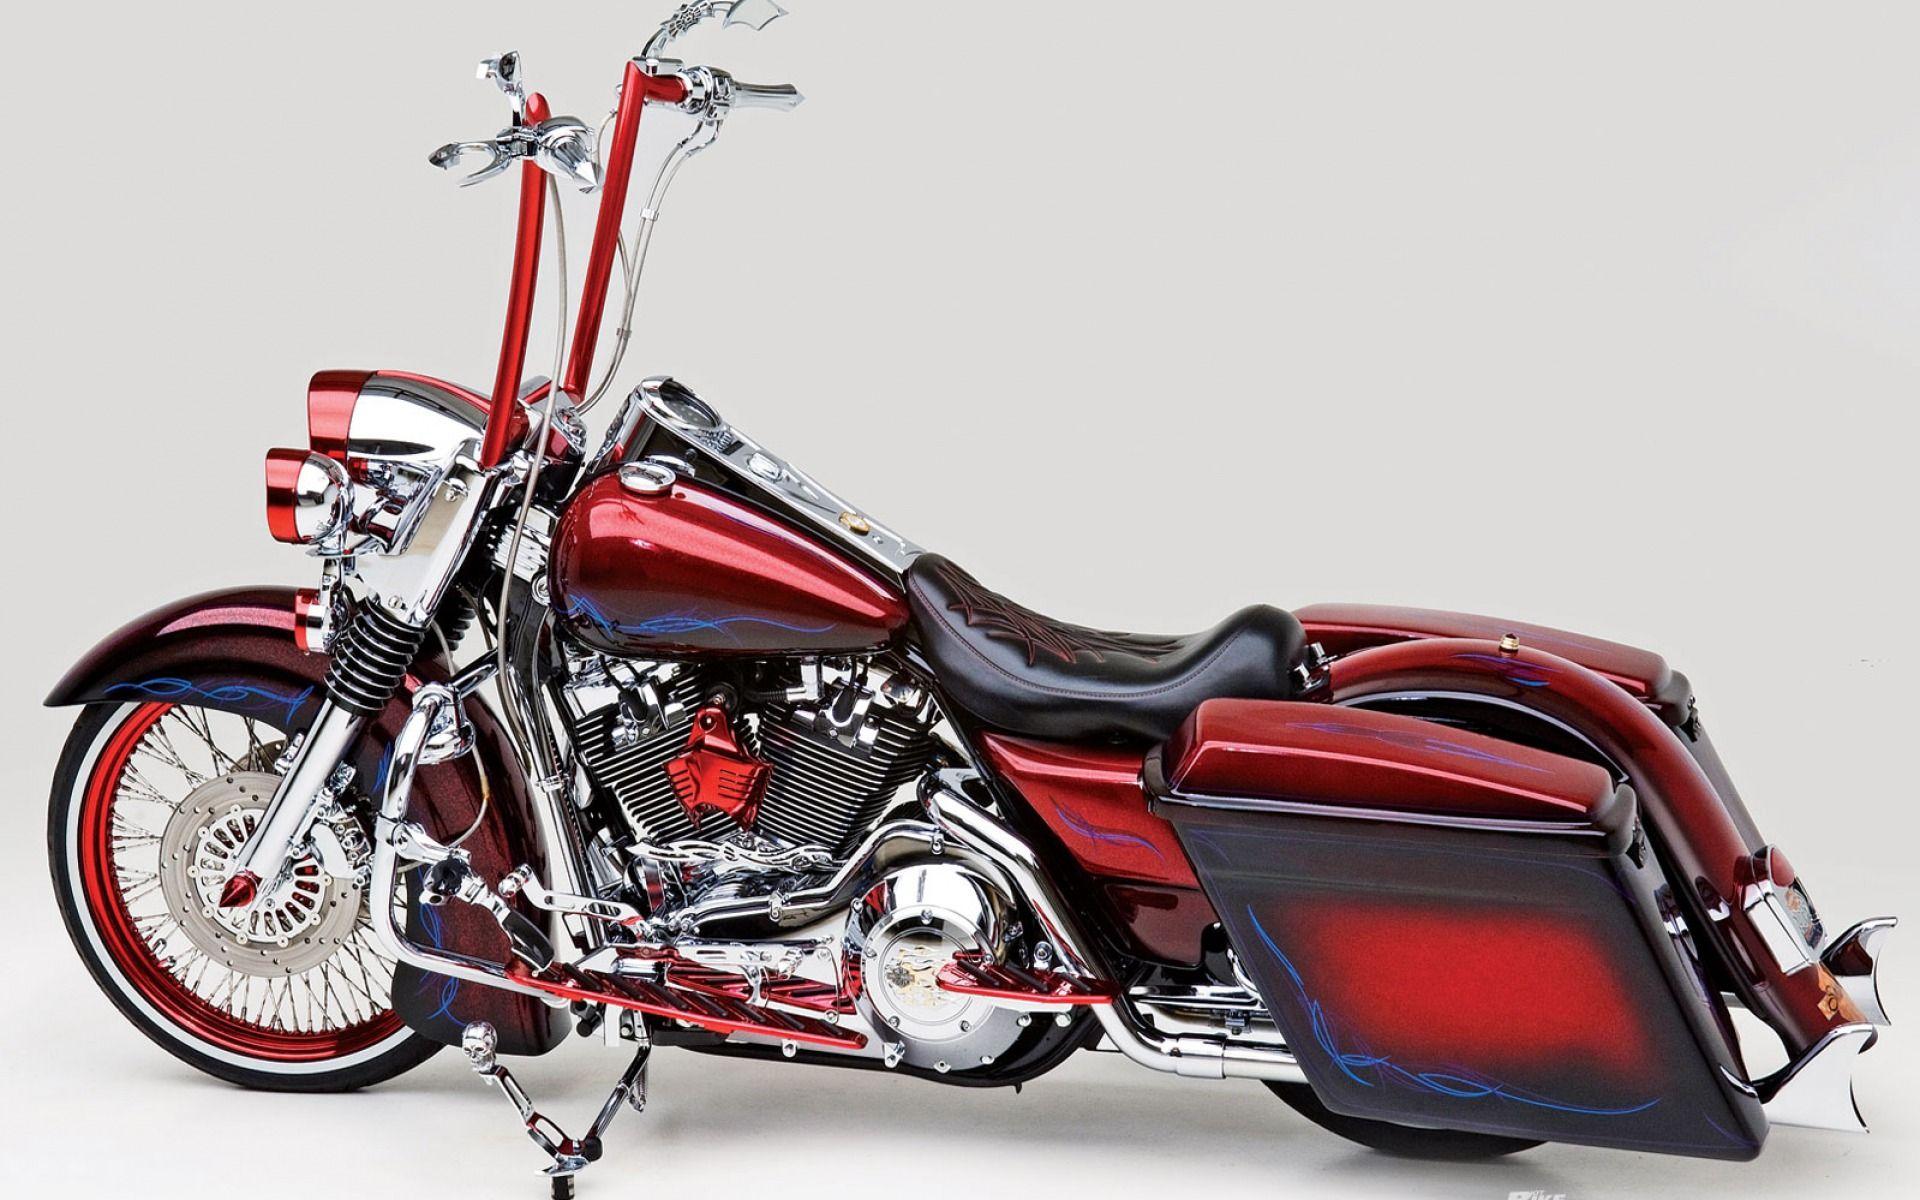 Harley Davidson: 2006 Harley Davidson Road King